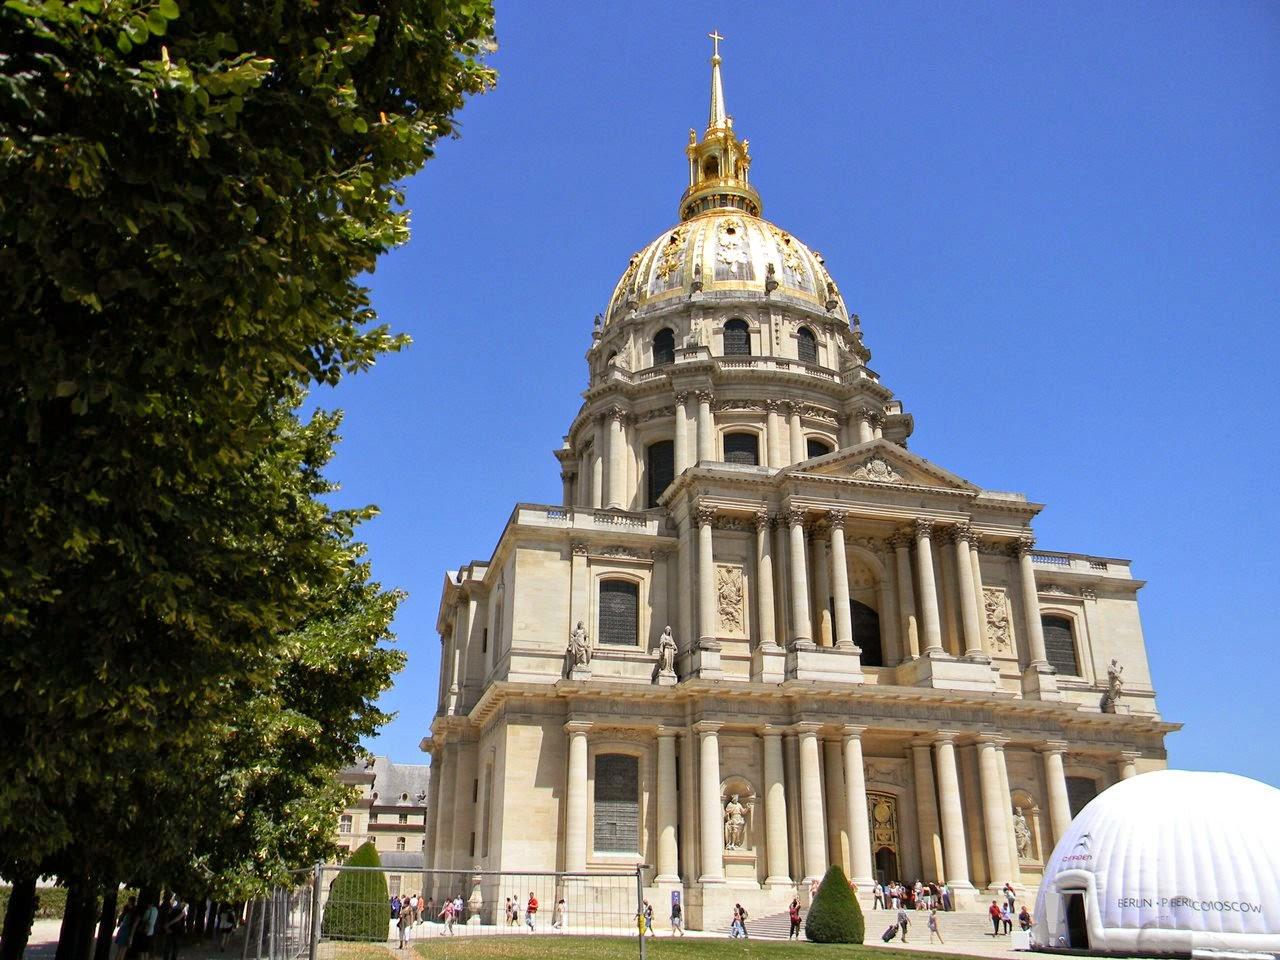 Napoleon, budowle, Paryż, Francja